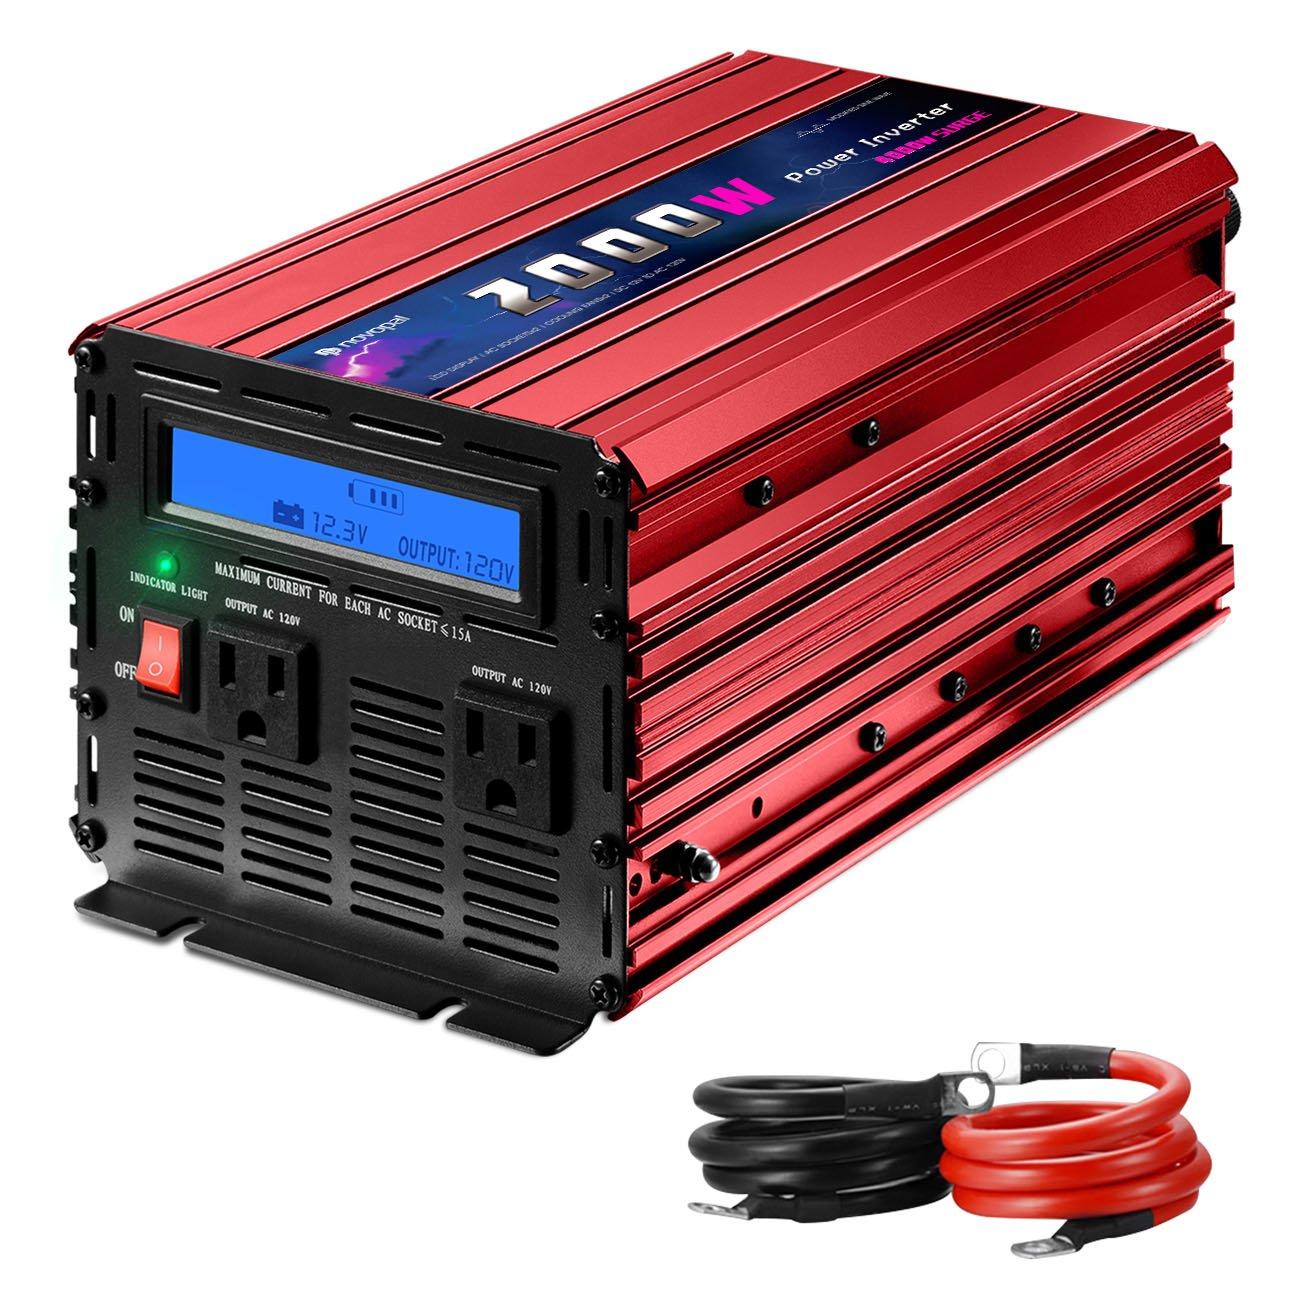 Novopal 2000W Power Inverter Modified Sine Wave DC 12v to AC 120v with Big LCD Display (Peak 4000W,Red Color)